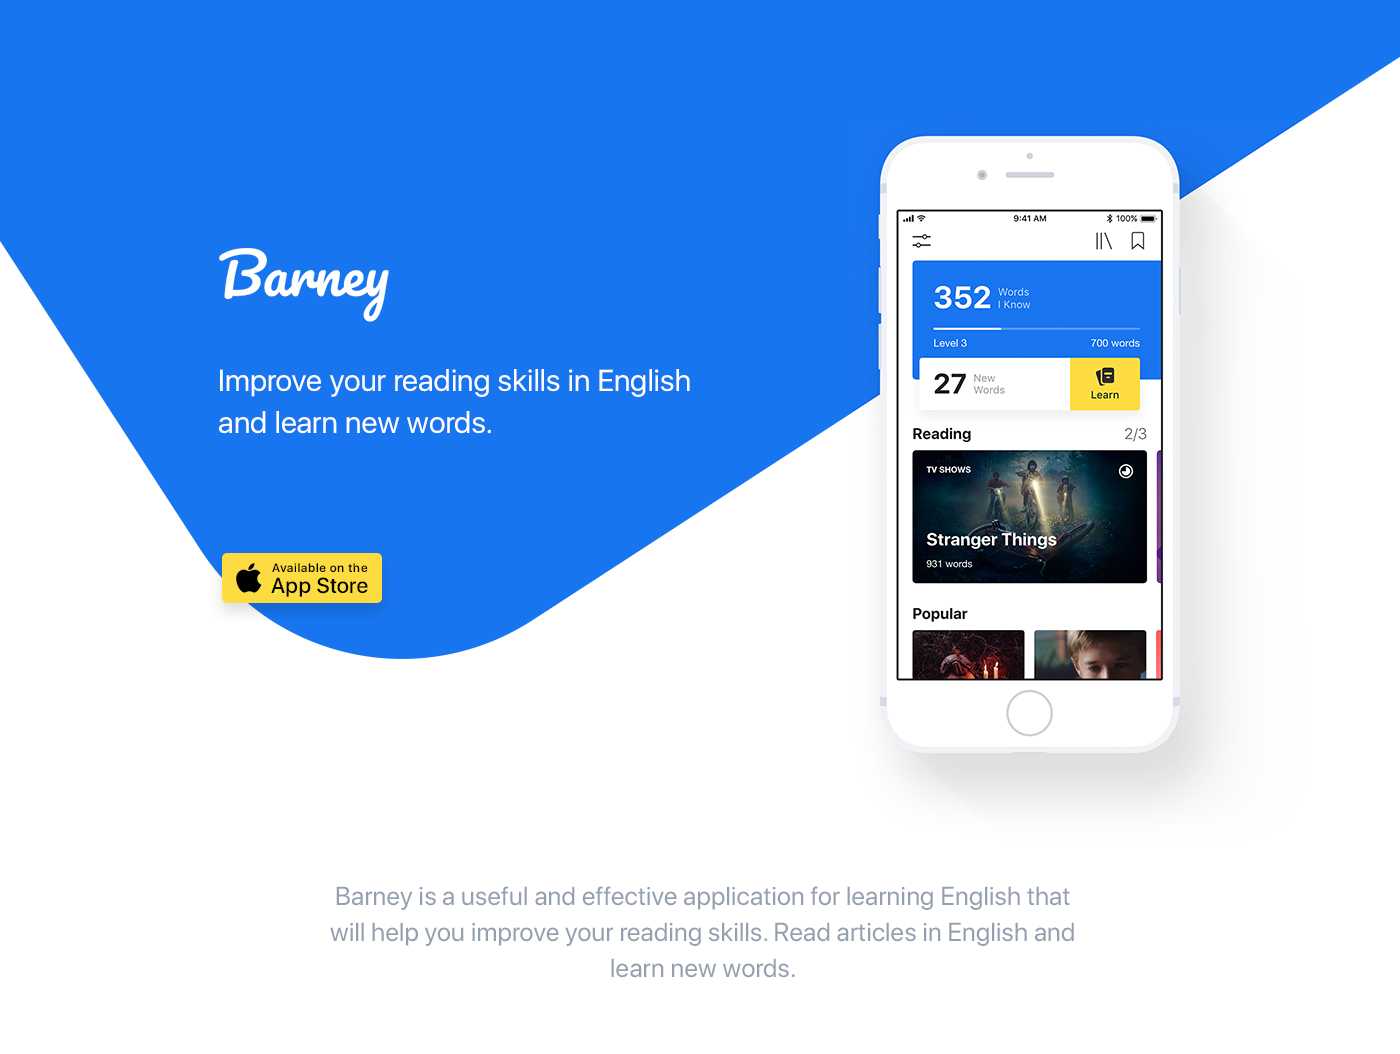 barney iphone apple ios english words learn read book text